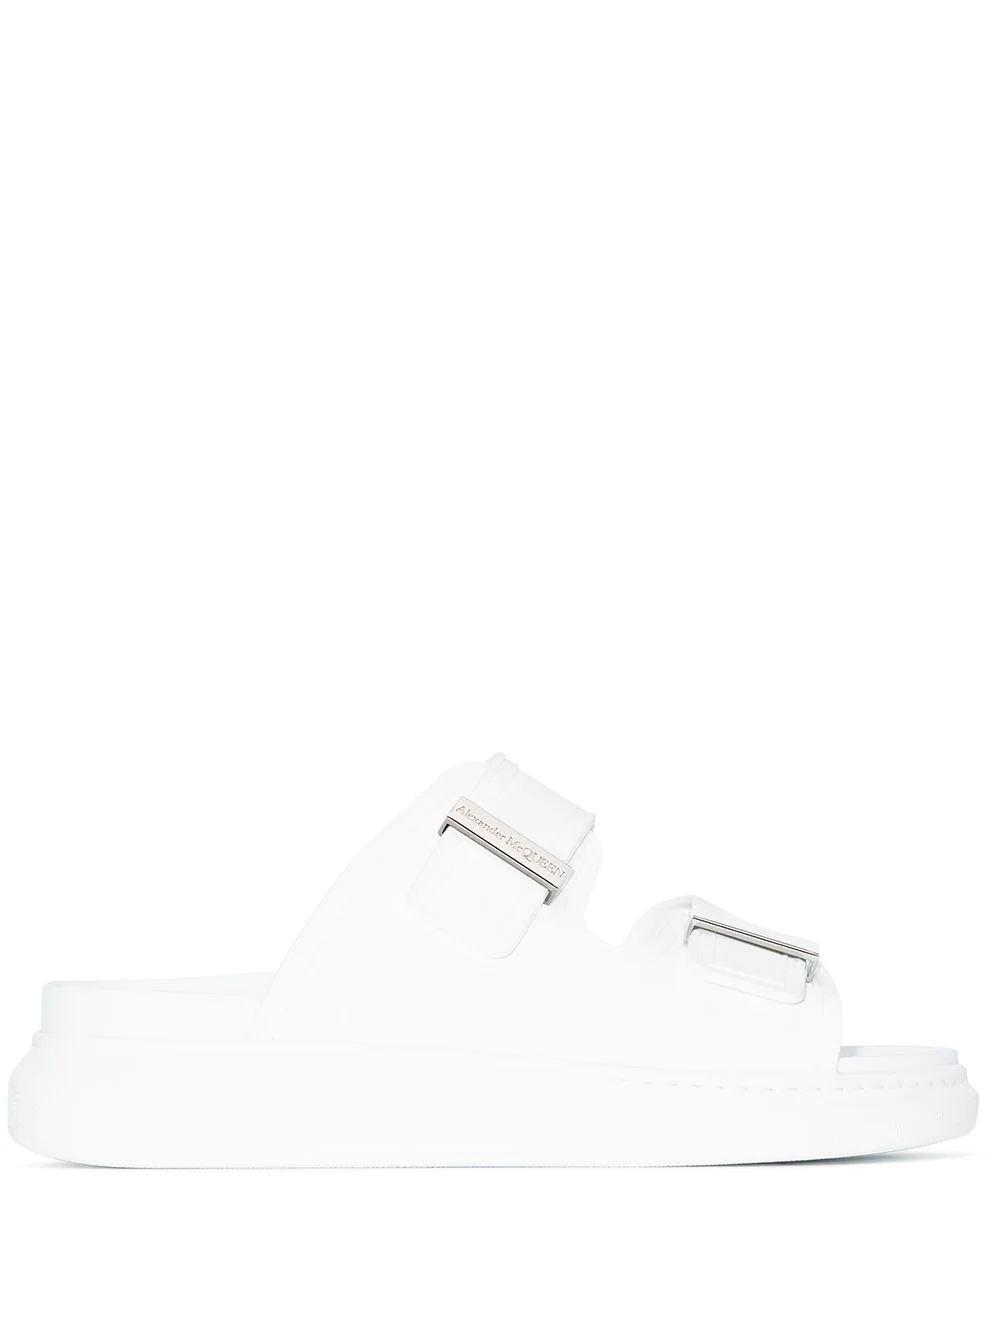 Double Thick Strap Slide Sandal